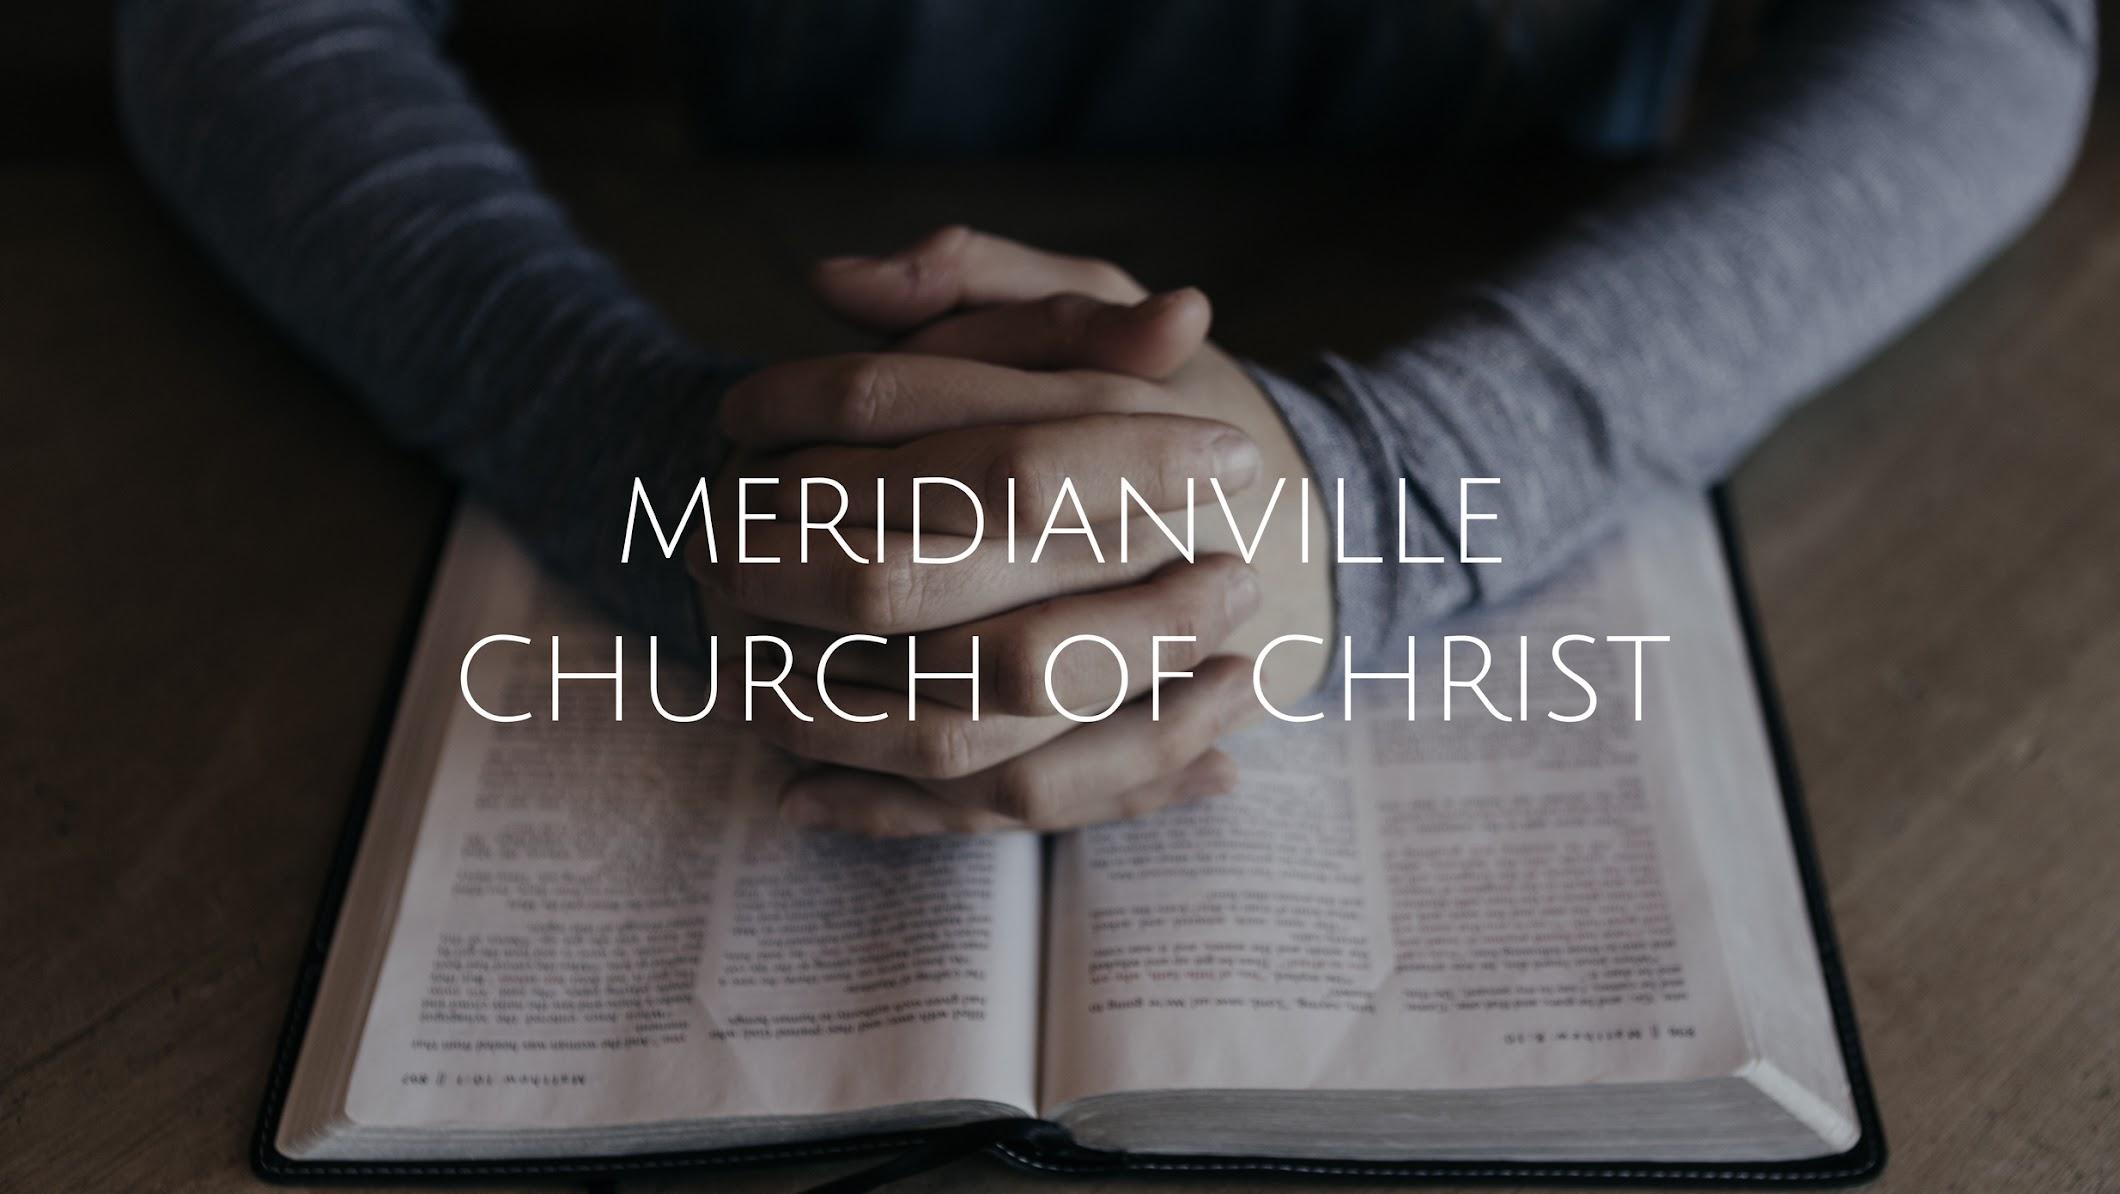 Meridianville Church of Christ